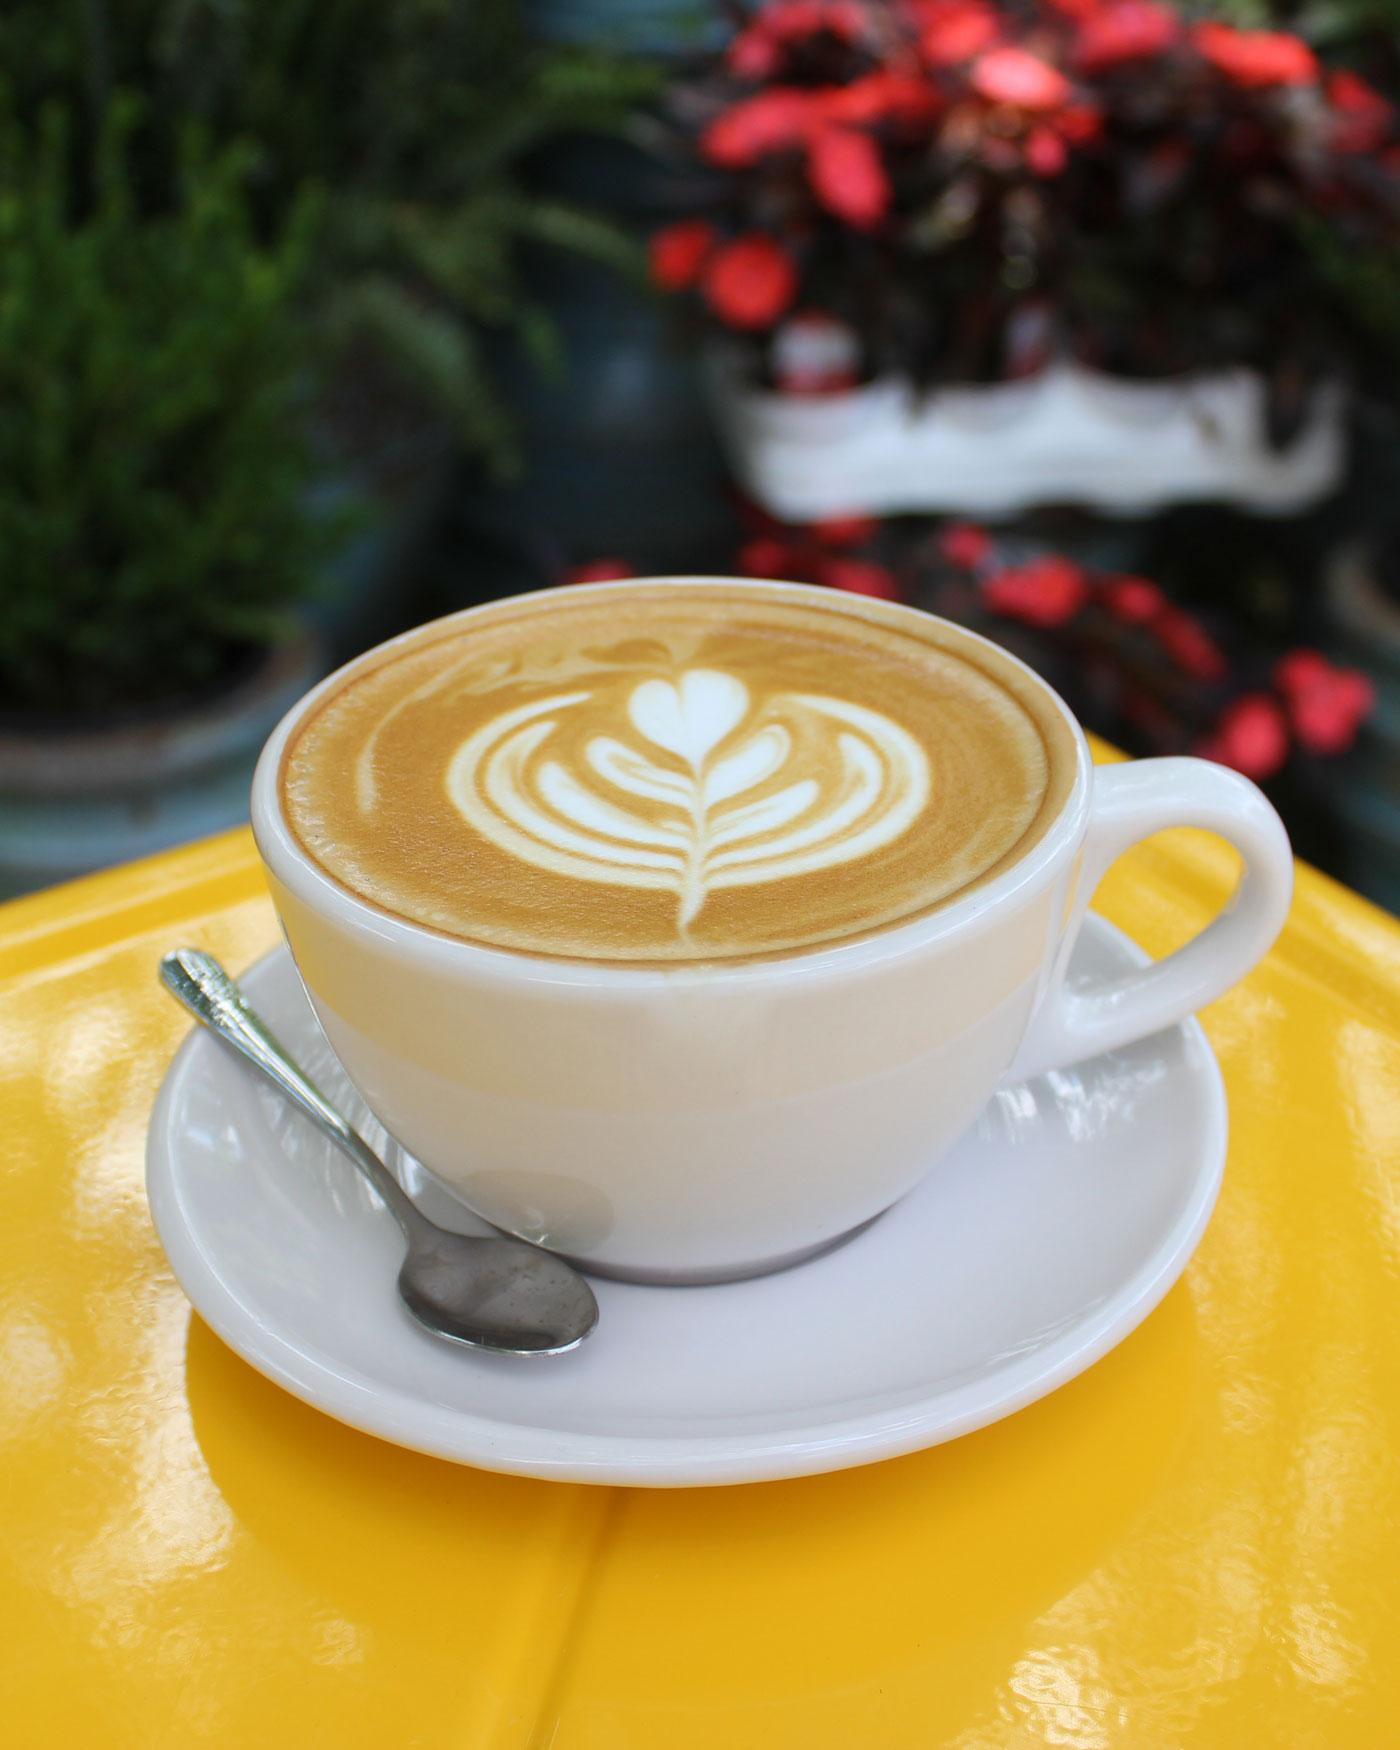 Sauce magazine first look maypop coffee garden shop in webster click below for slideshow malvernweather Choice Image